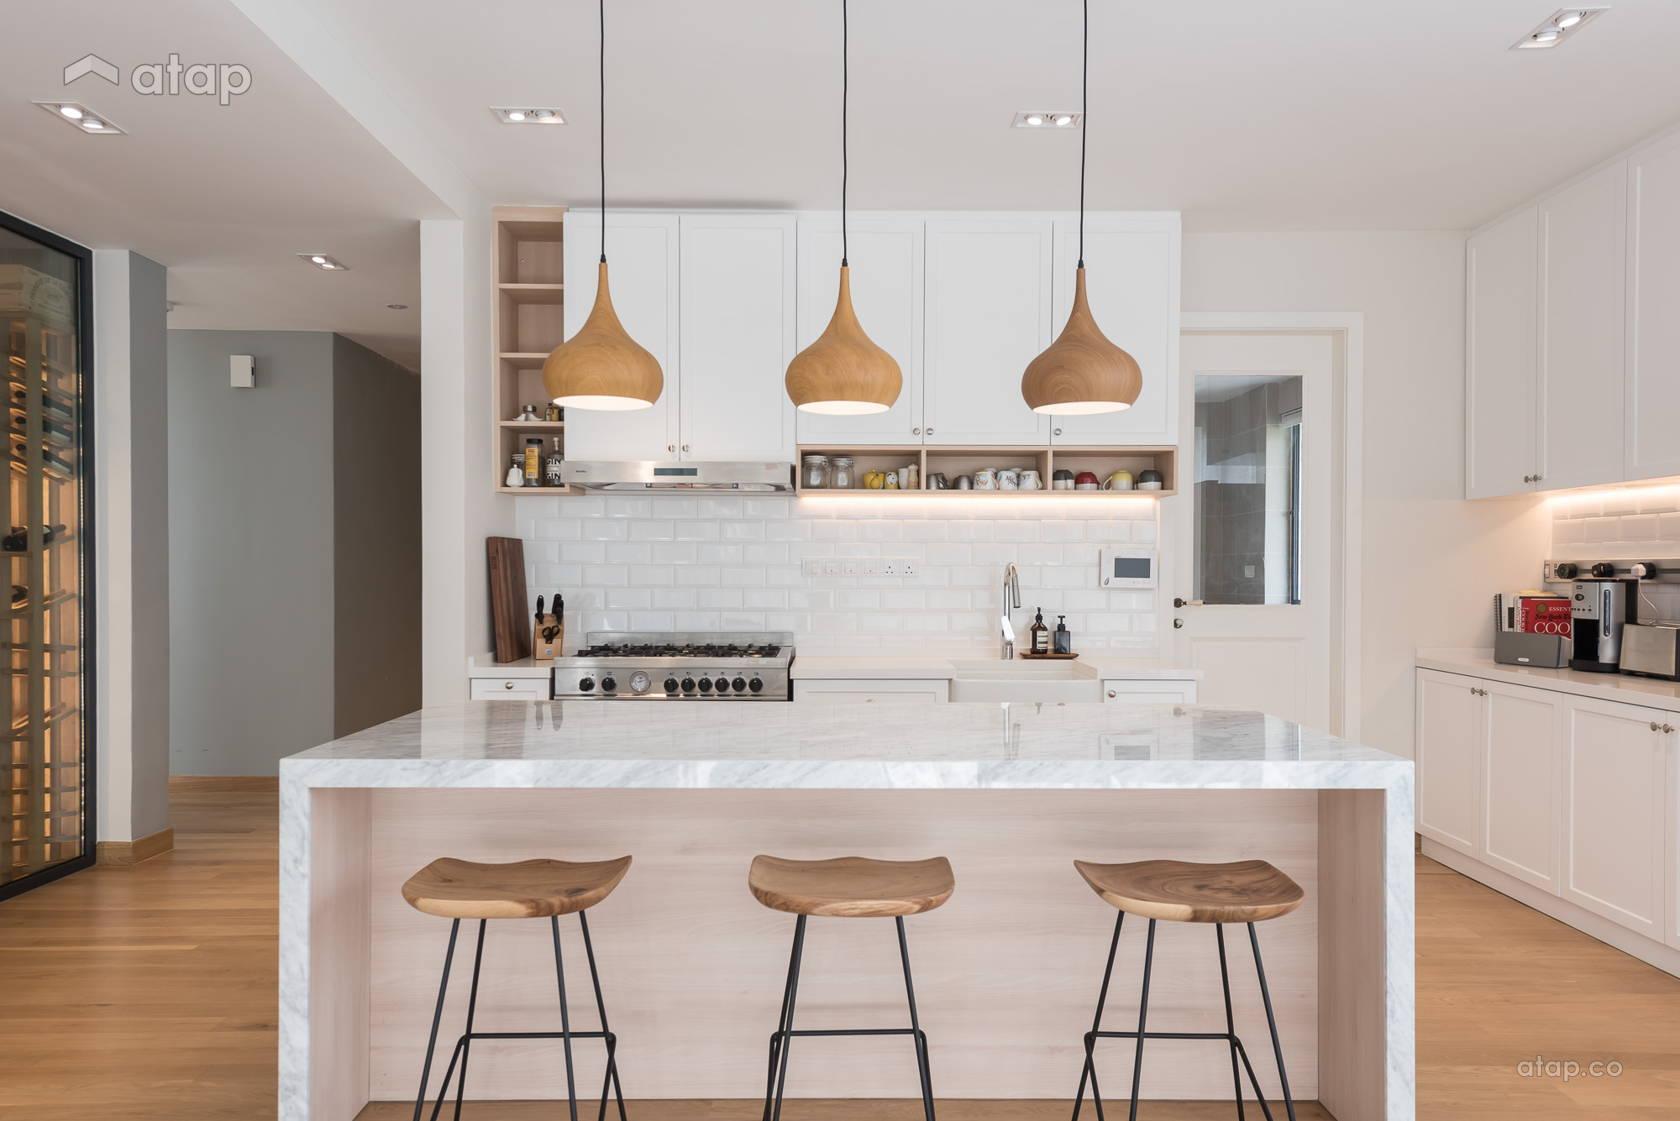 Minimalistic Modern Dining Room Kitchen @ Scandinavian Bungalow | When Simplicity Matters